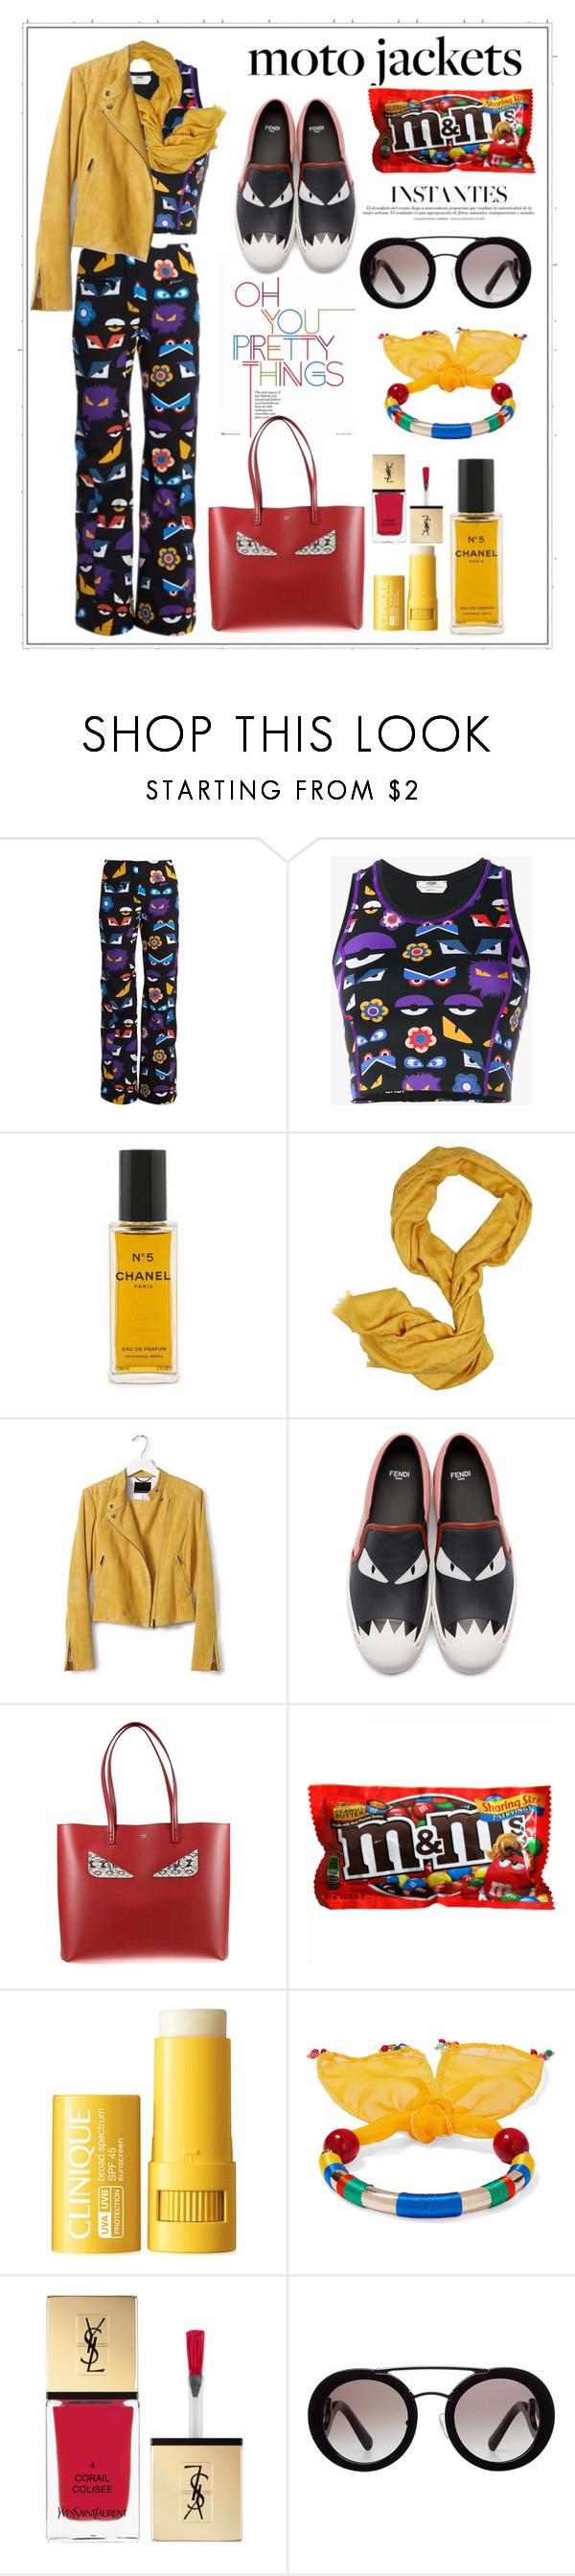 """Untitled #322"" by meryflower ❤ liked on Polyvore featuring Hansen, Fendi, Chanel, Banana Republic, Clinique, Rosantica, Yves Saint Laurent, Prada and motojacket"